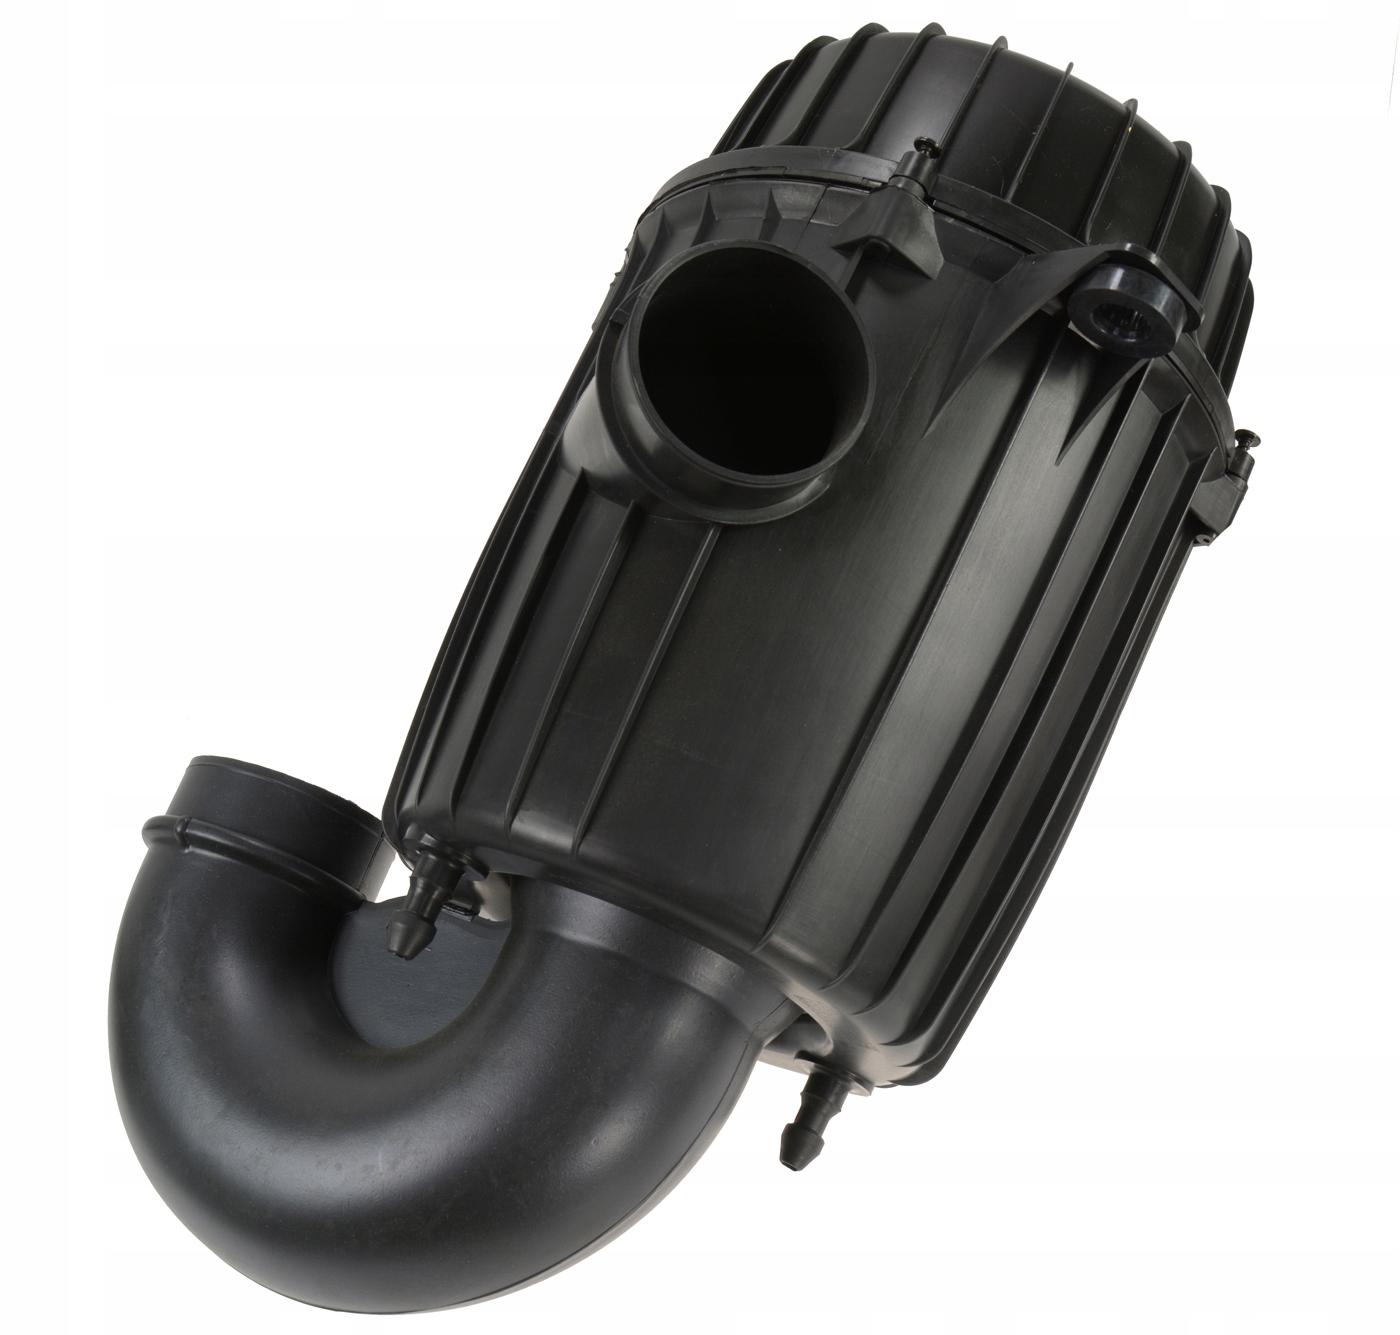 корпус фильтра воздуха 22 30 hdi boxer iii